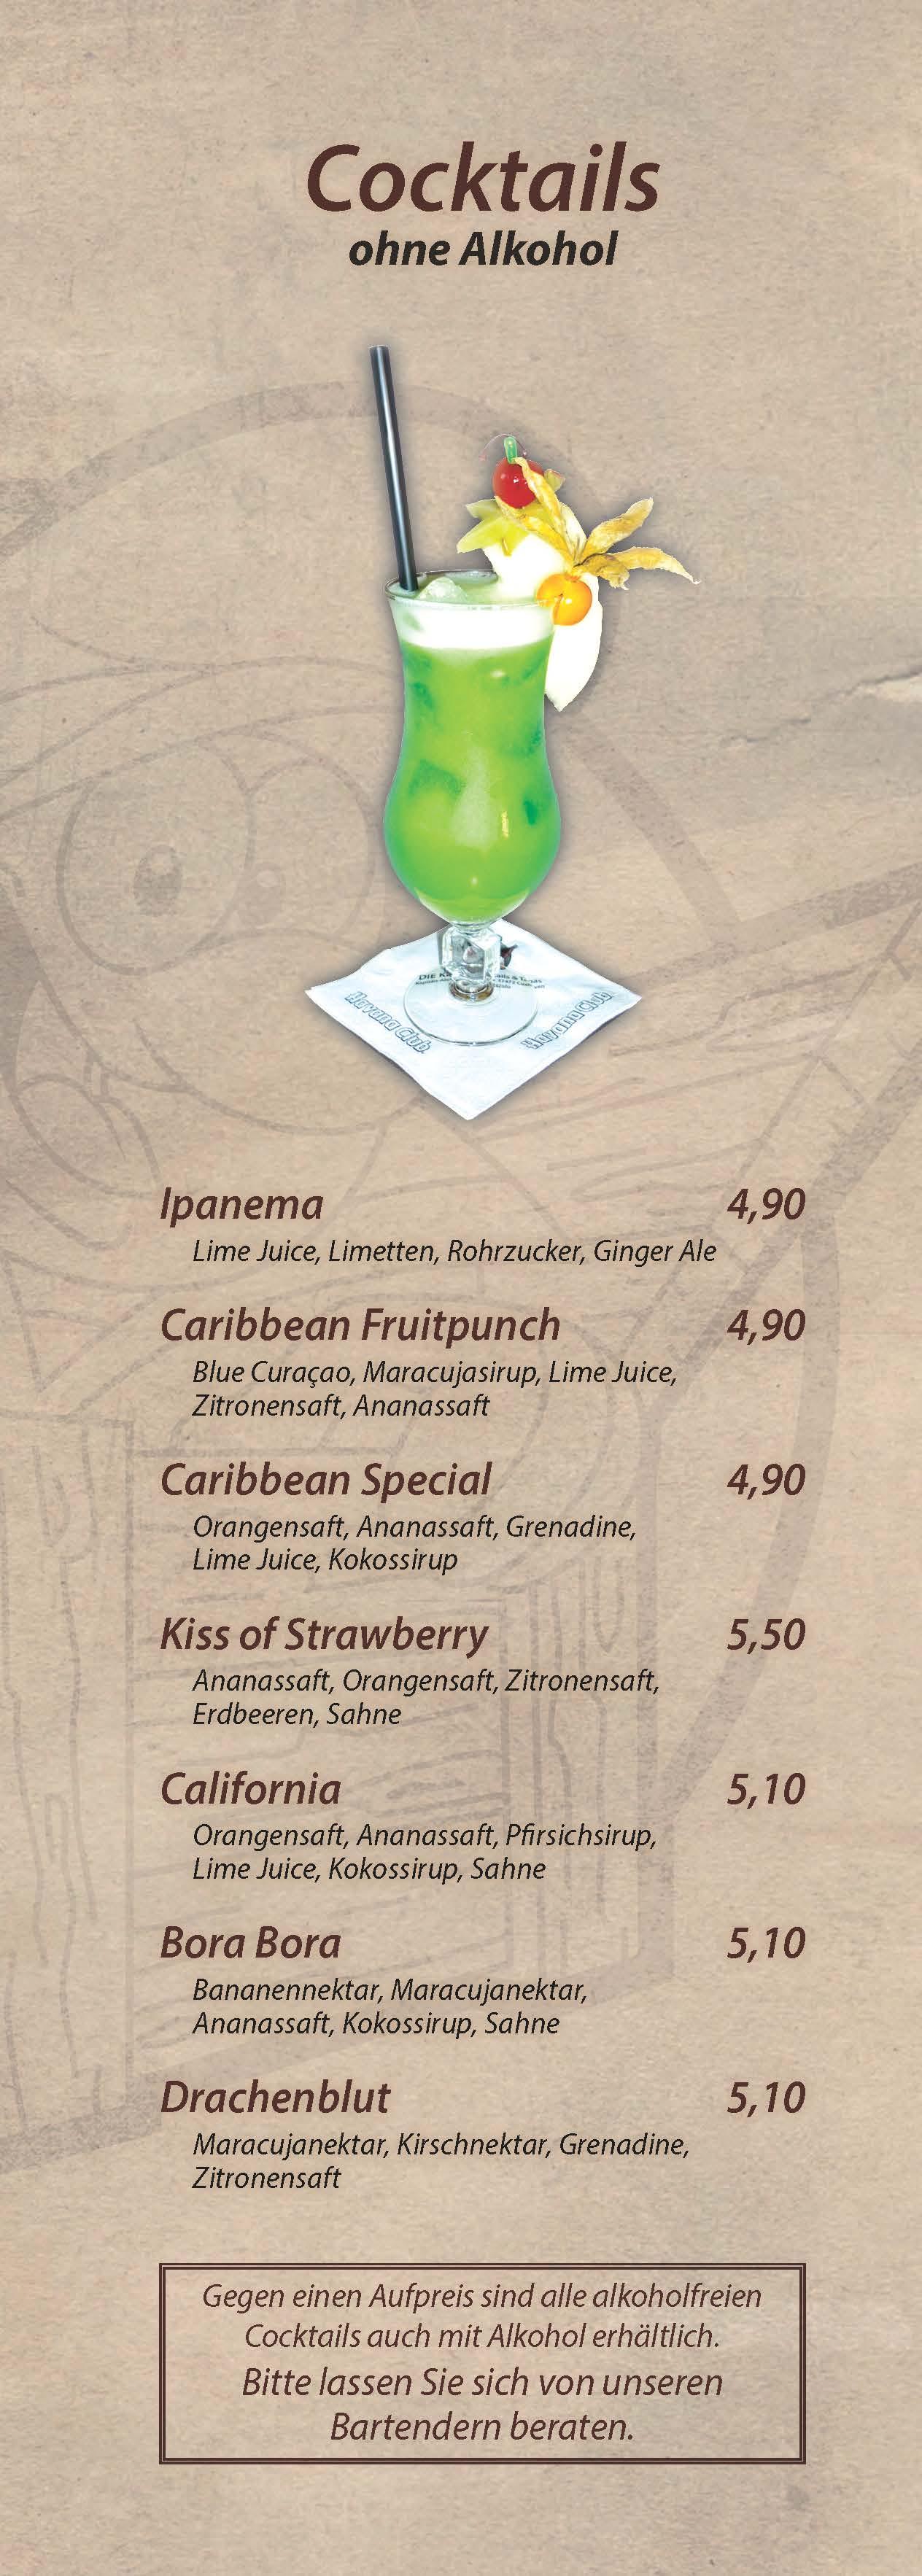 Cocktails ohne Alkohol - Cocktailbar Die Kiste in Cuxhaven